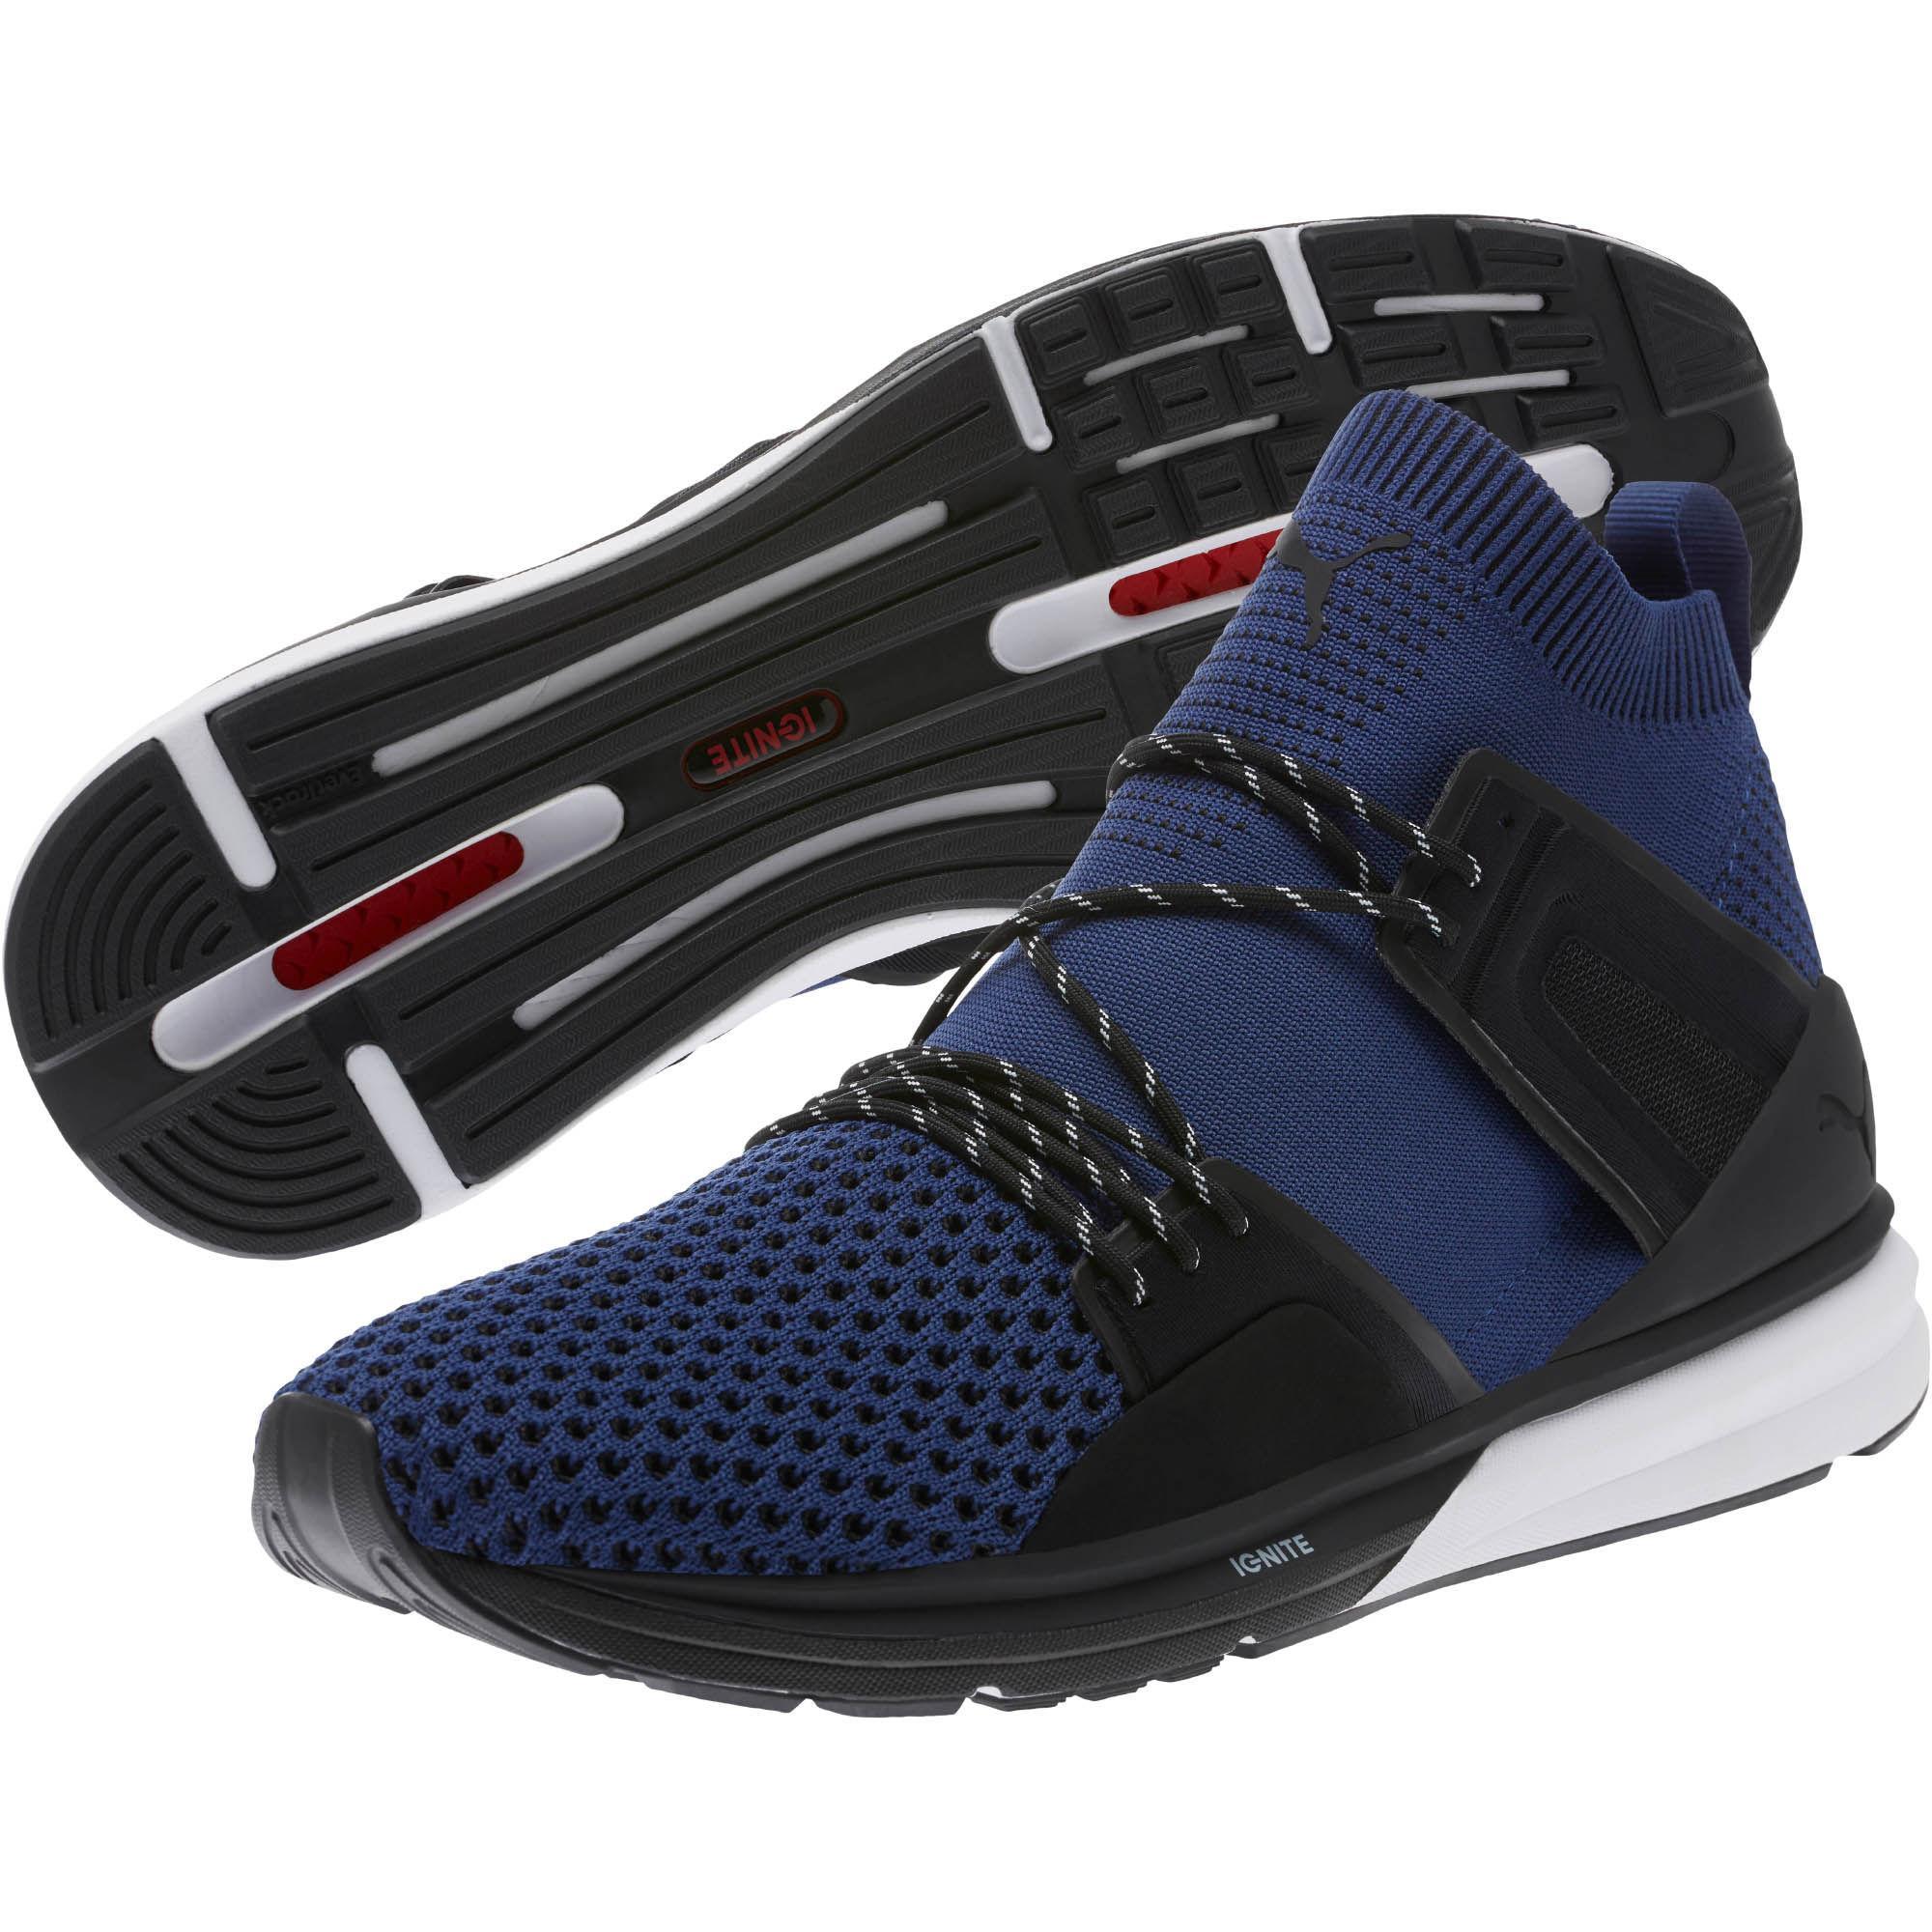 354e70becce Lyst - Puma B.o.g Limitless Hi Evoknit Men s Training Shoes in Black ...